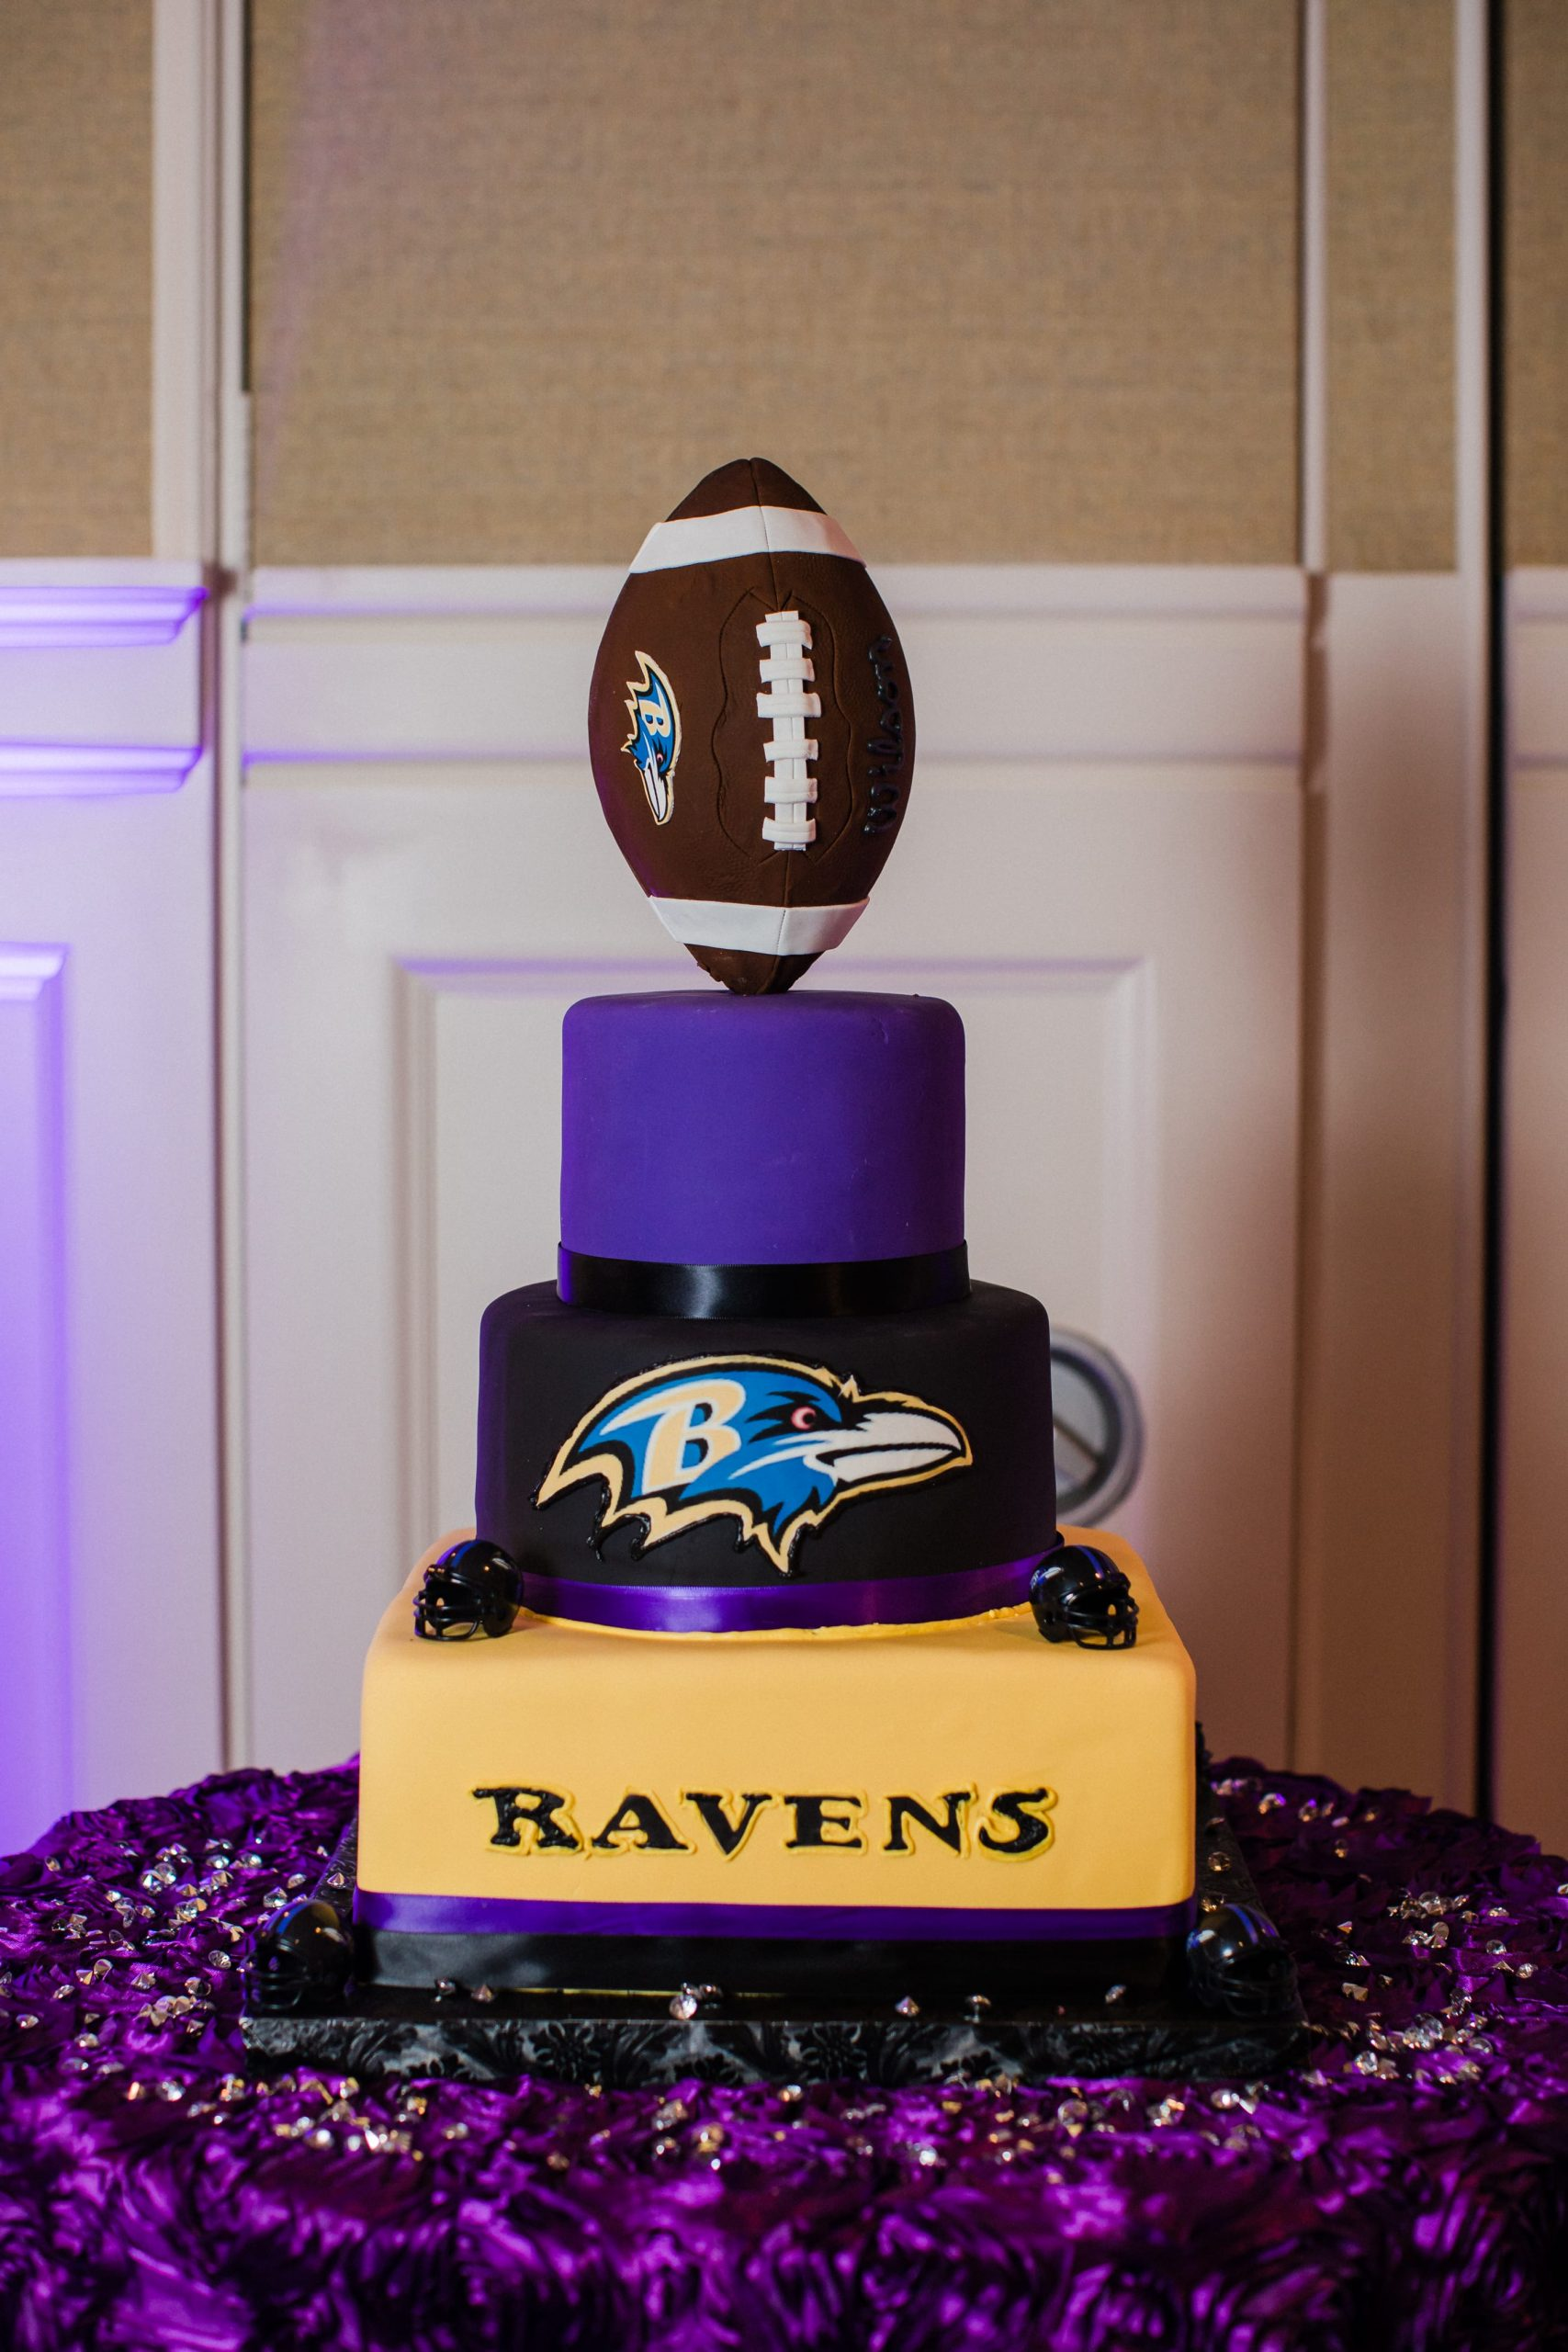 Ravens football groom's cake